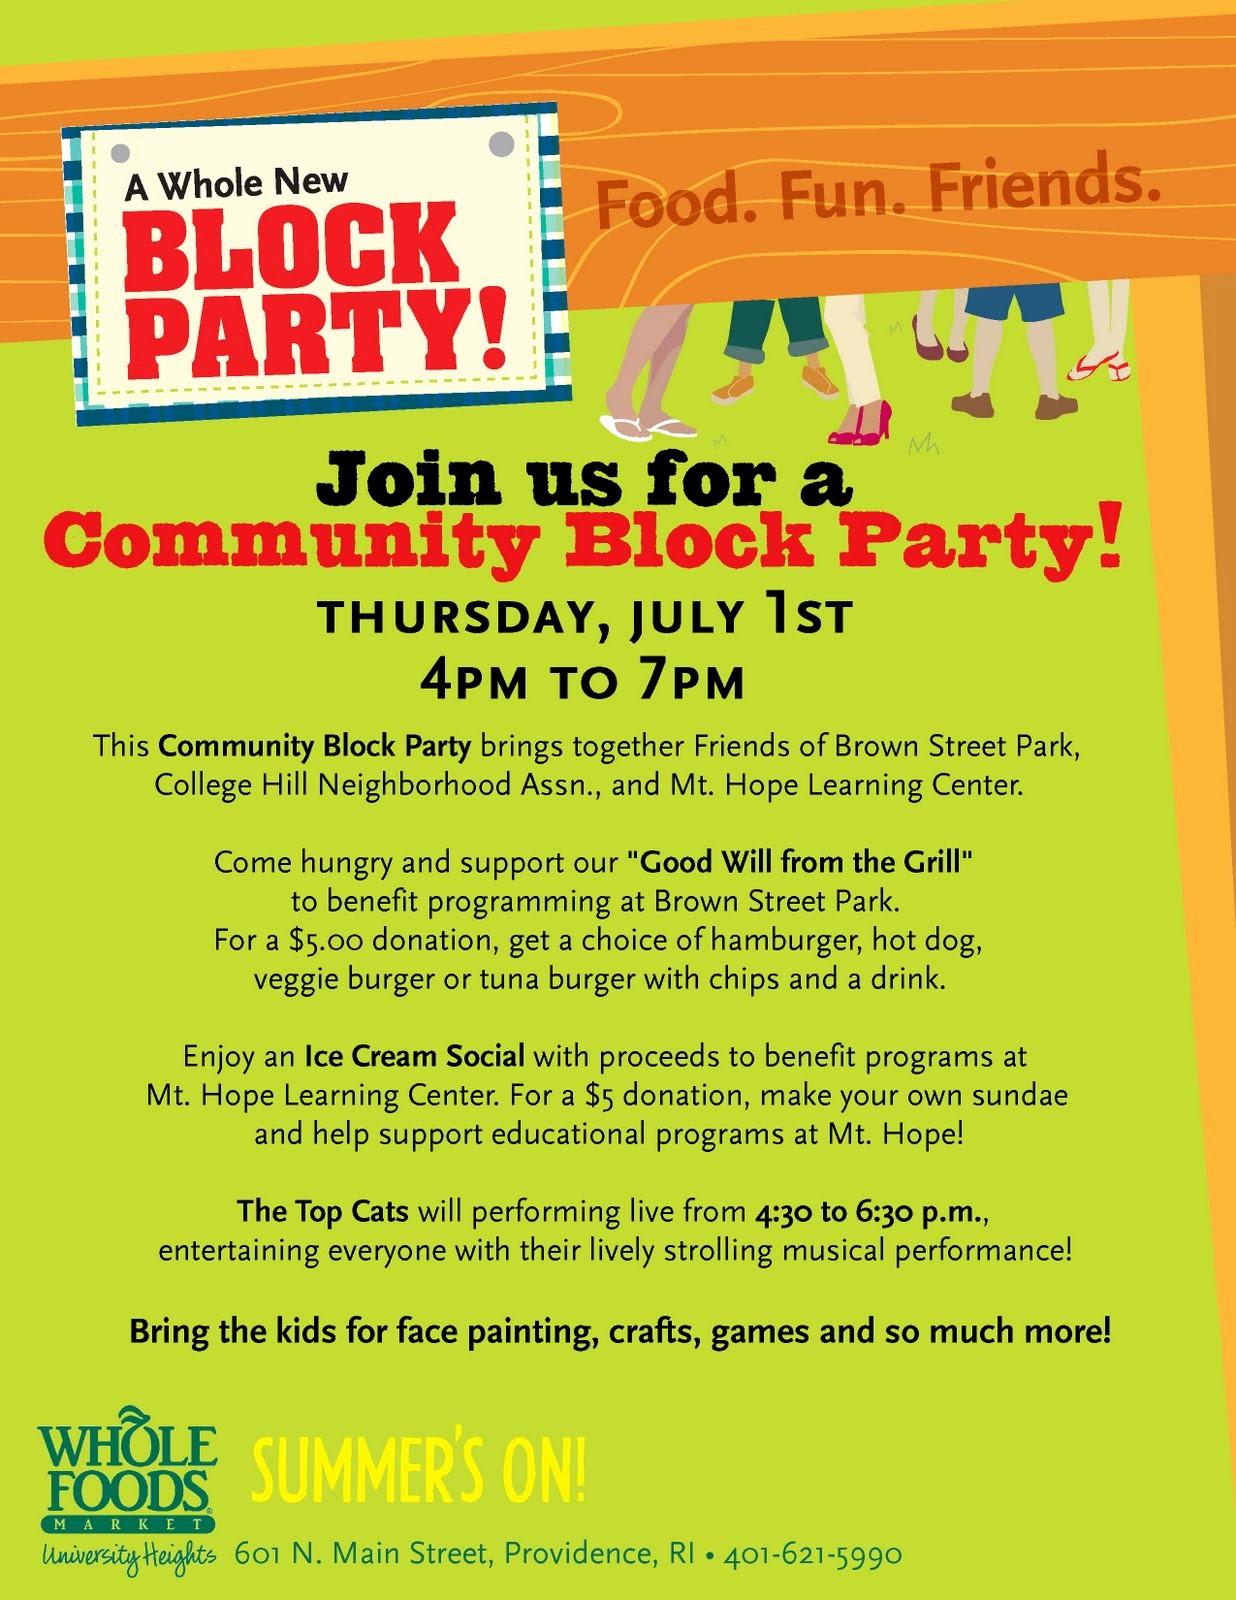 Block Party Flyer Templates Free Elegant Friends Of Brown Street Park June 2010